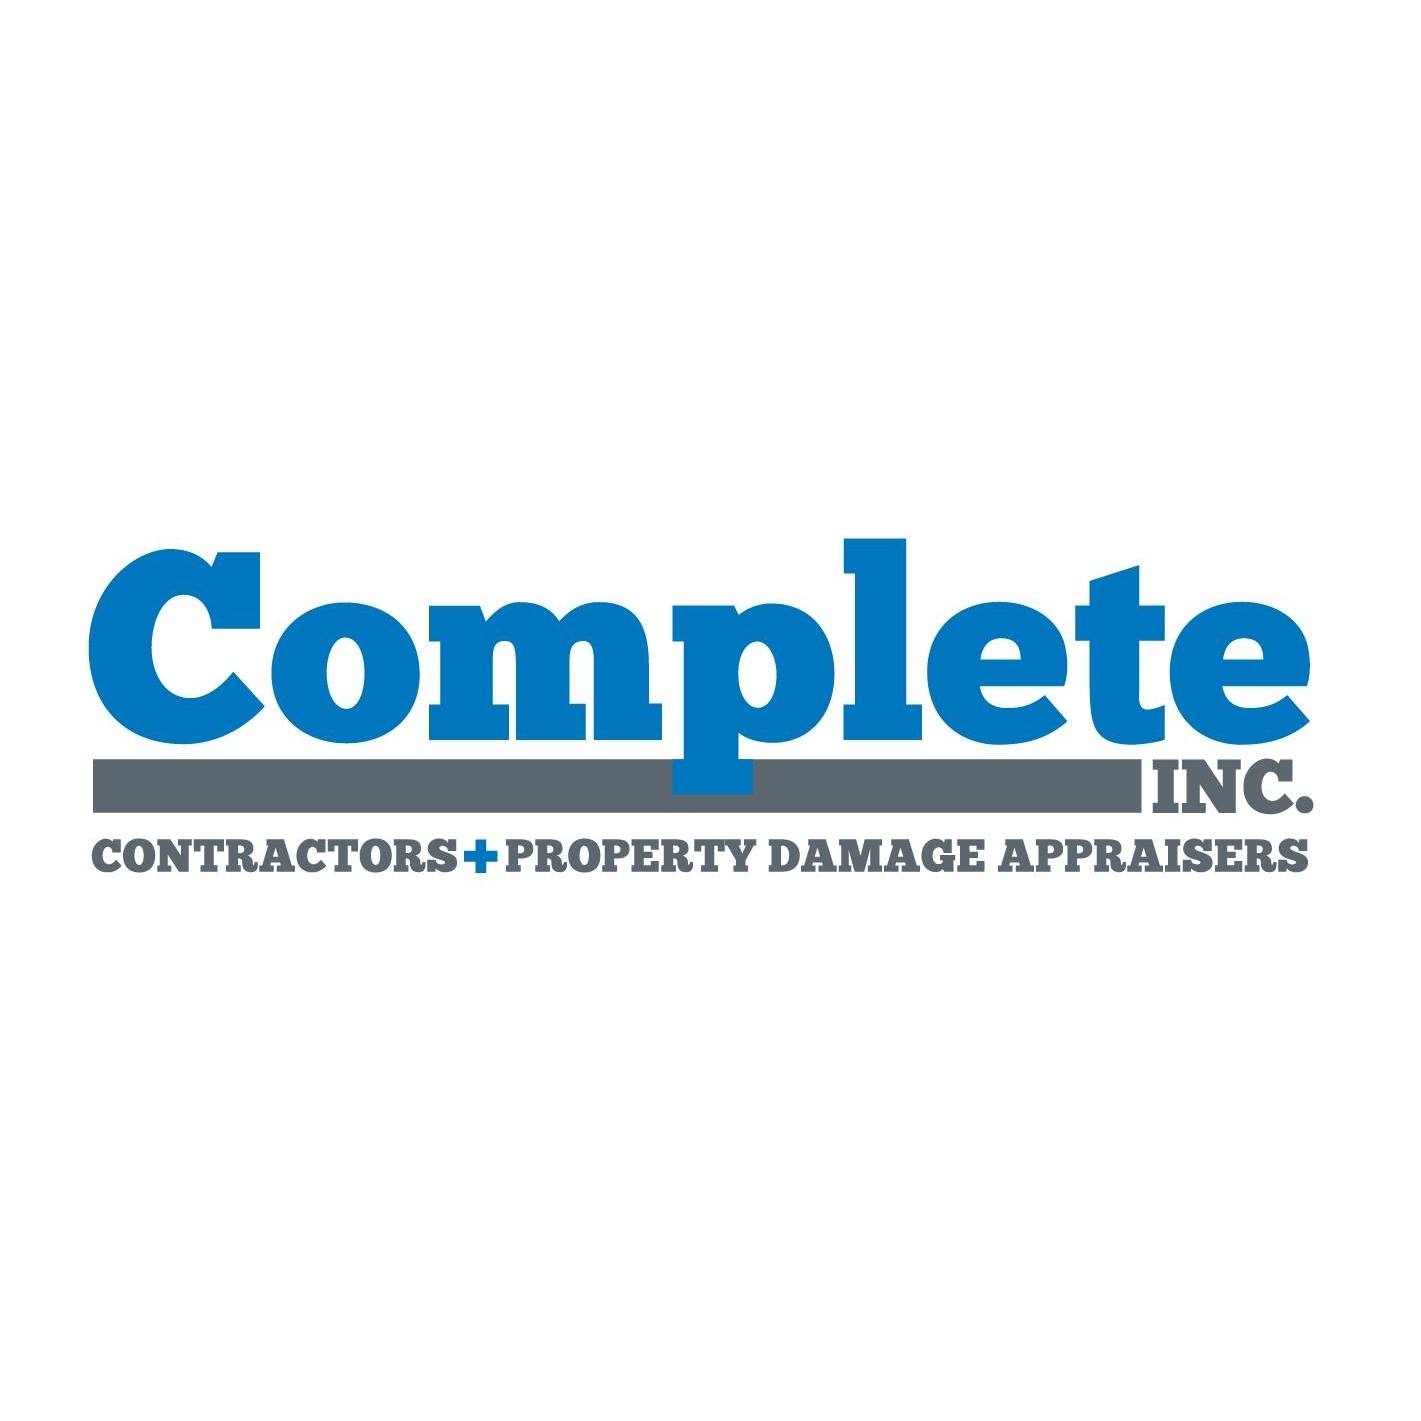 Complete General Contractors, Inc - Gulf Breeze, FL - General Contractors